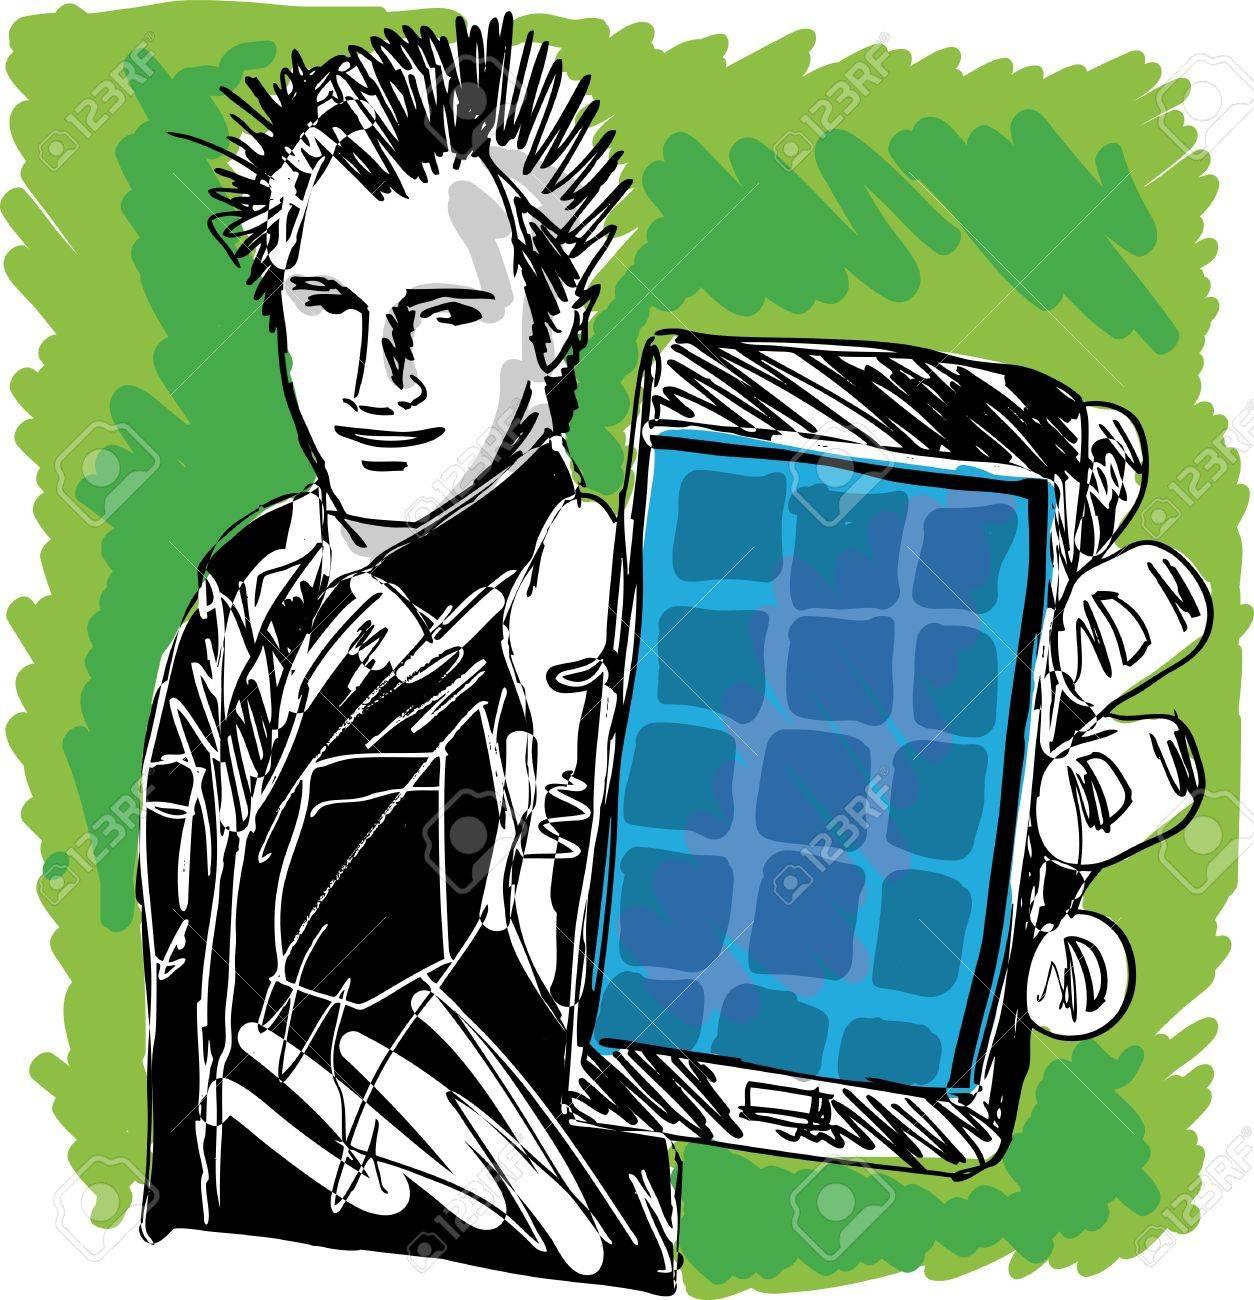 Sketch of Handsome guy showing his Modern Smartphone  Vector Stock Vector - 13059425